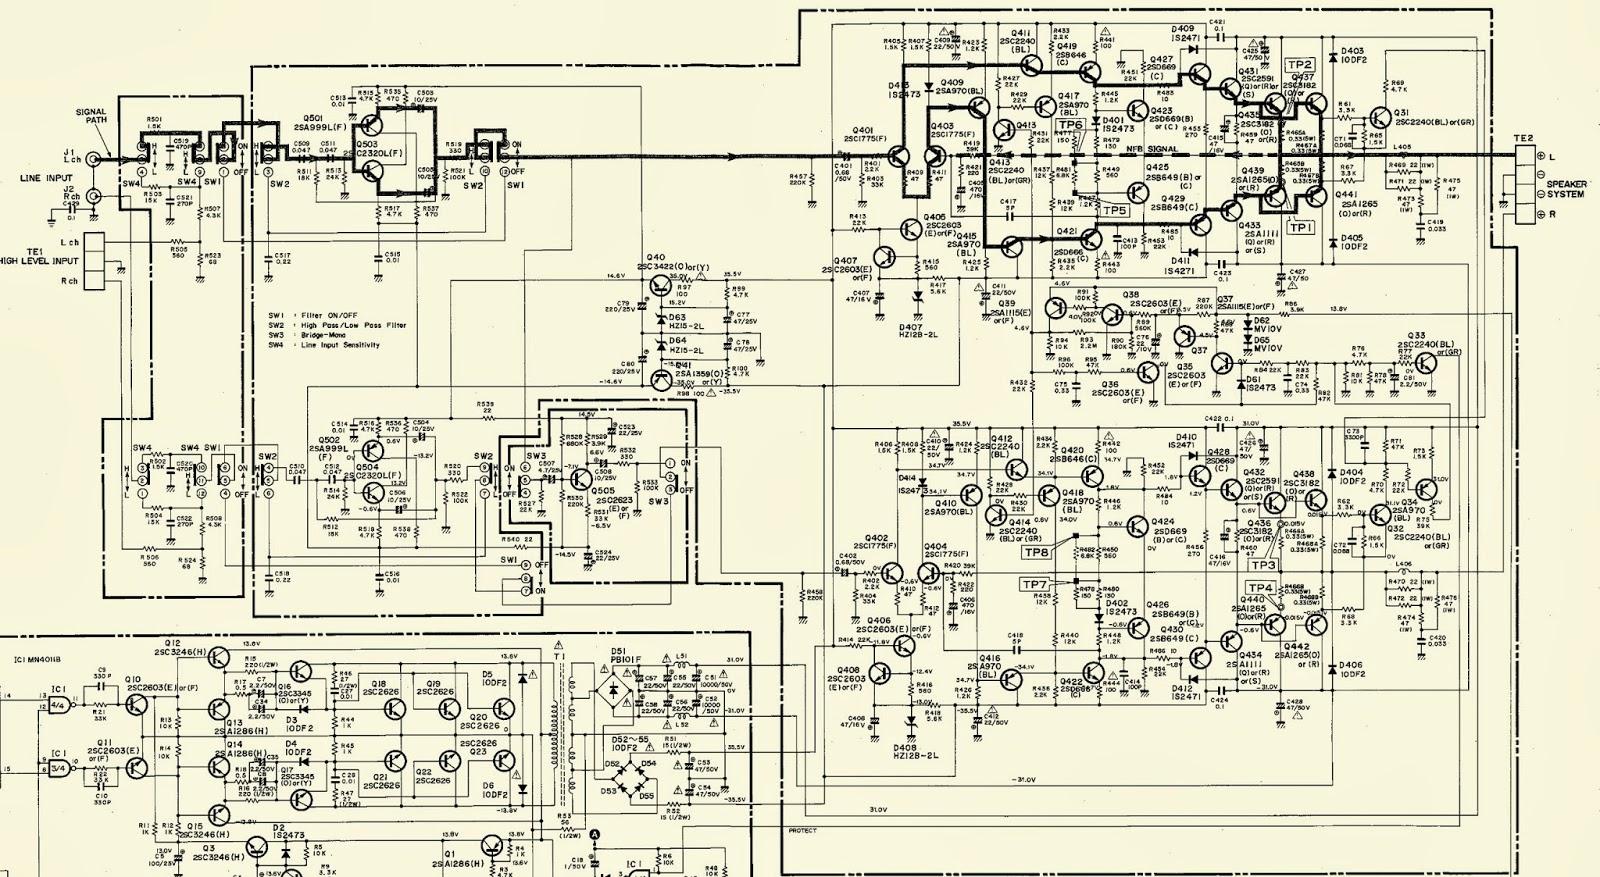 harman kardon ca260 hi fi car amplifier schematic diagram circuit diagram [ 1600 x 877 Pixel ]